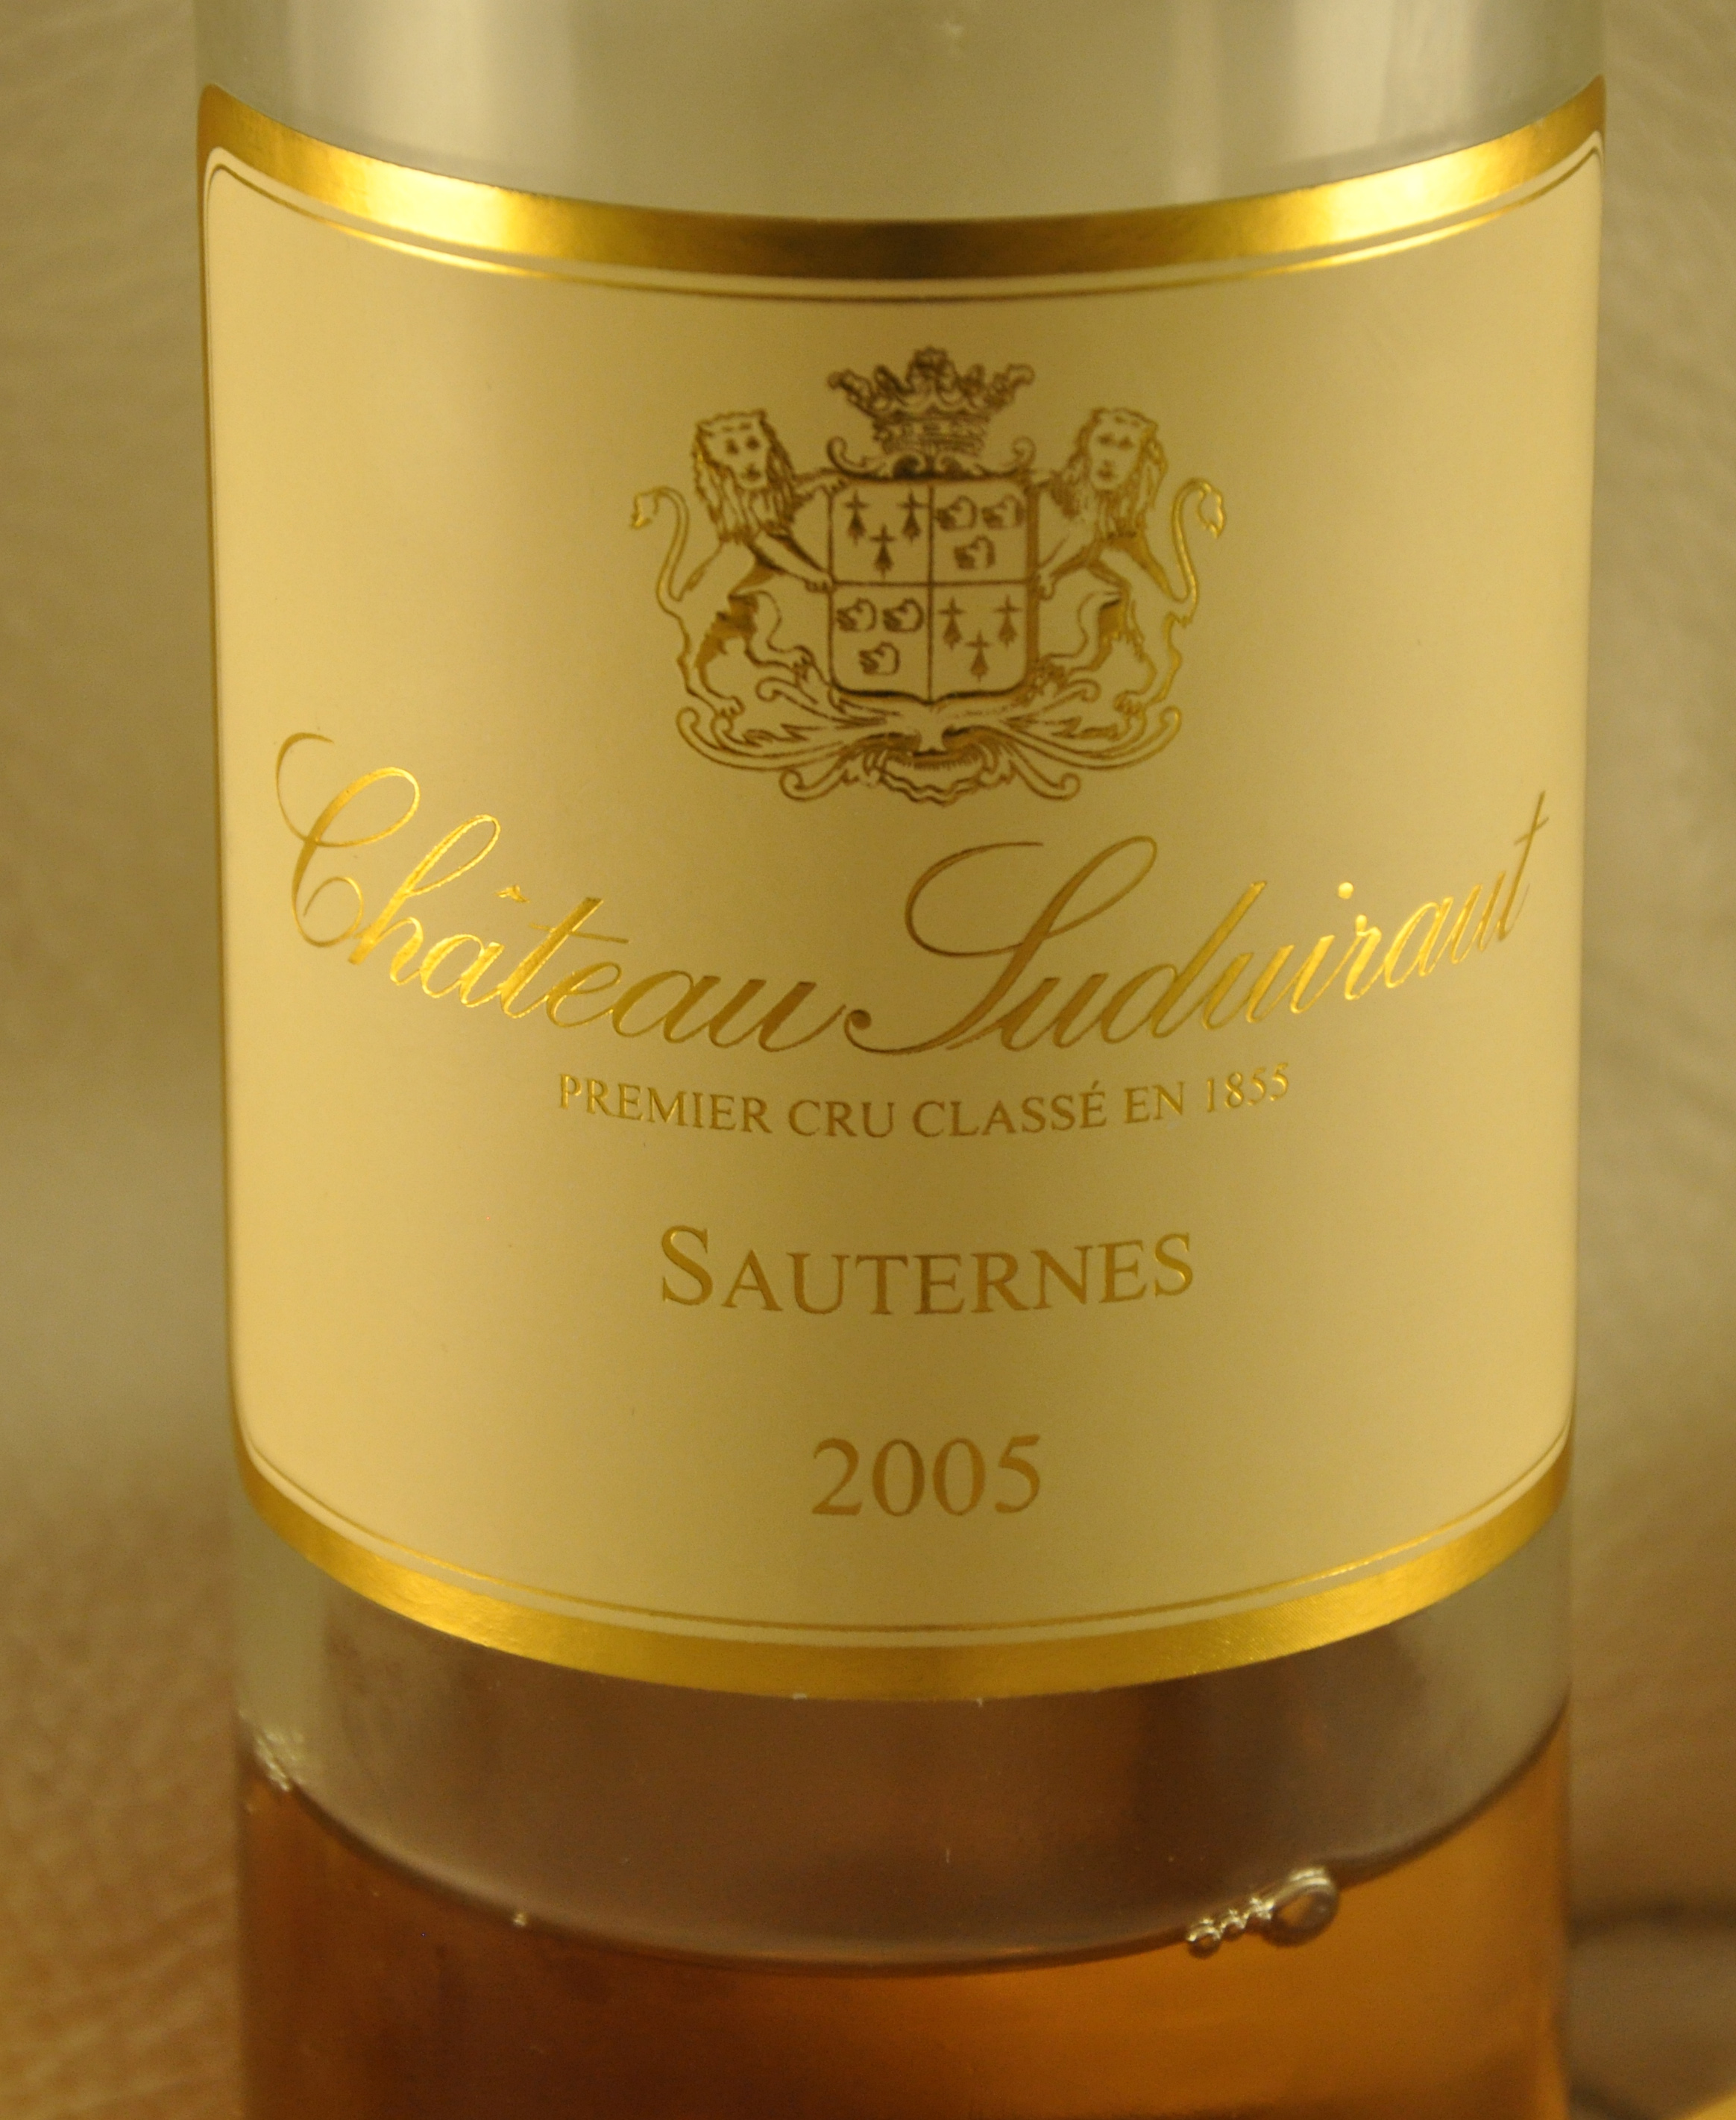 Château Suduiraut – 2005